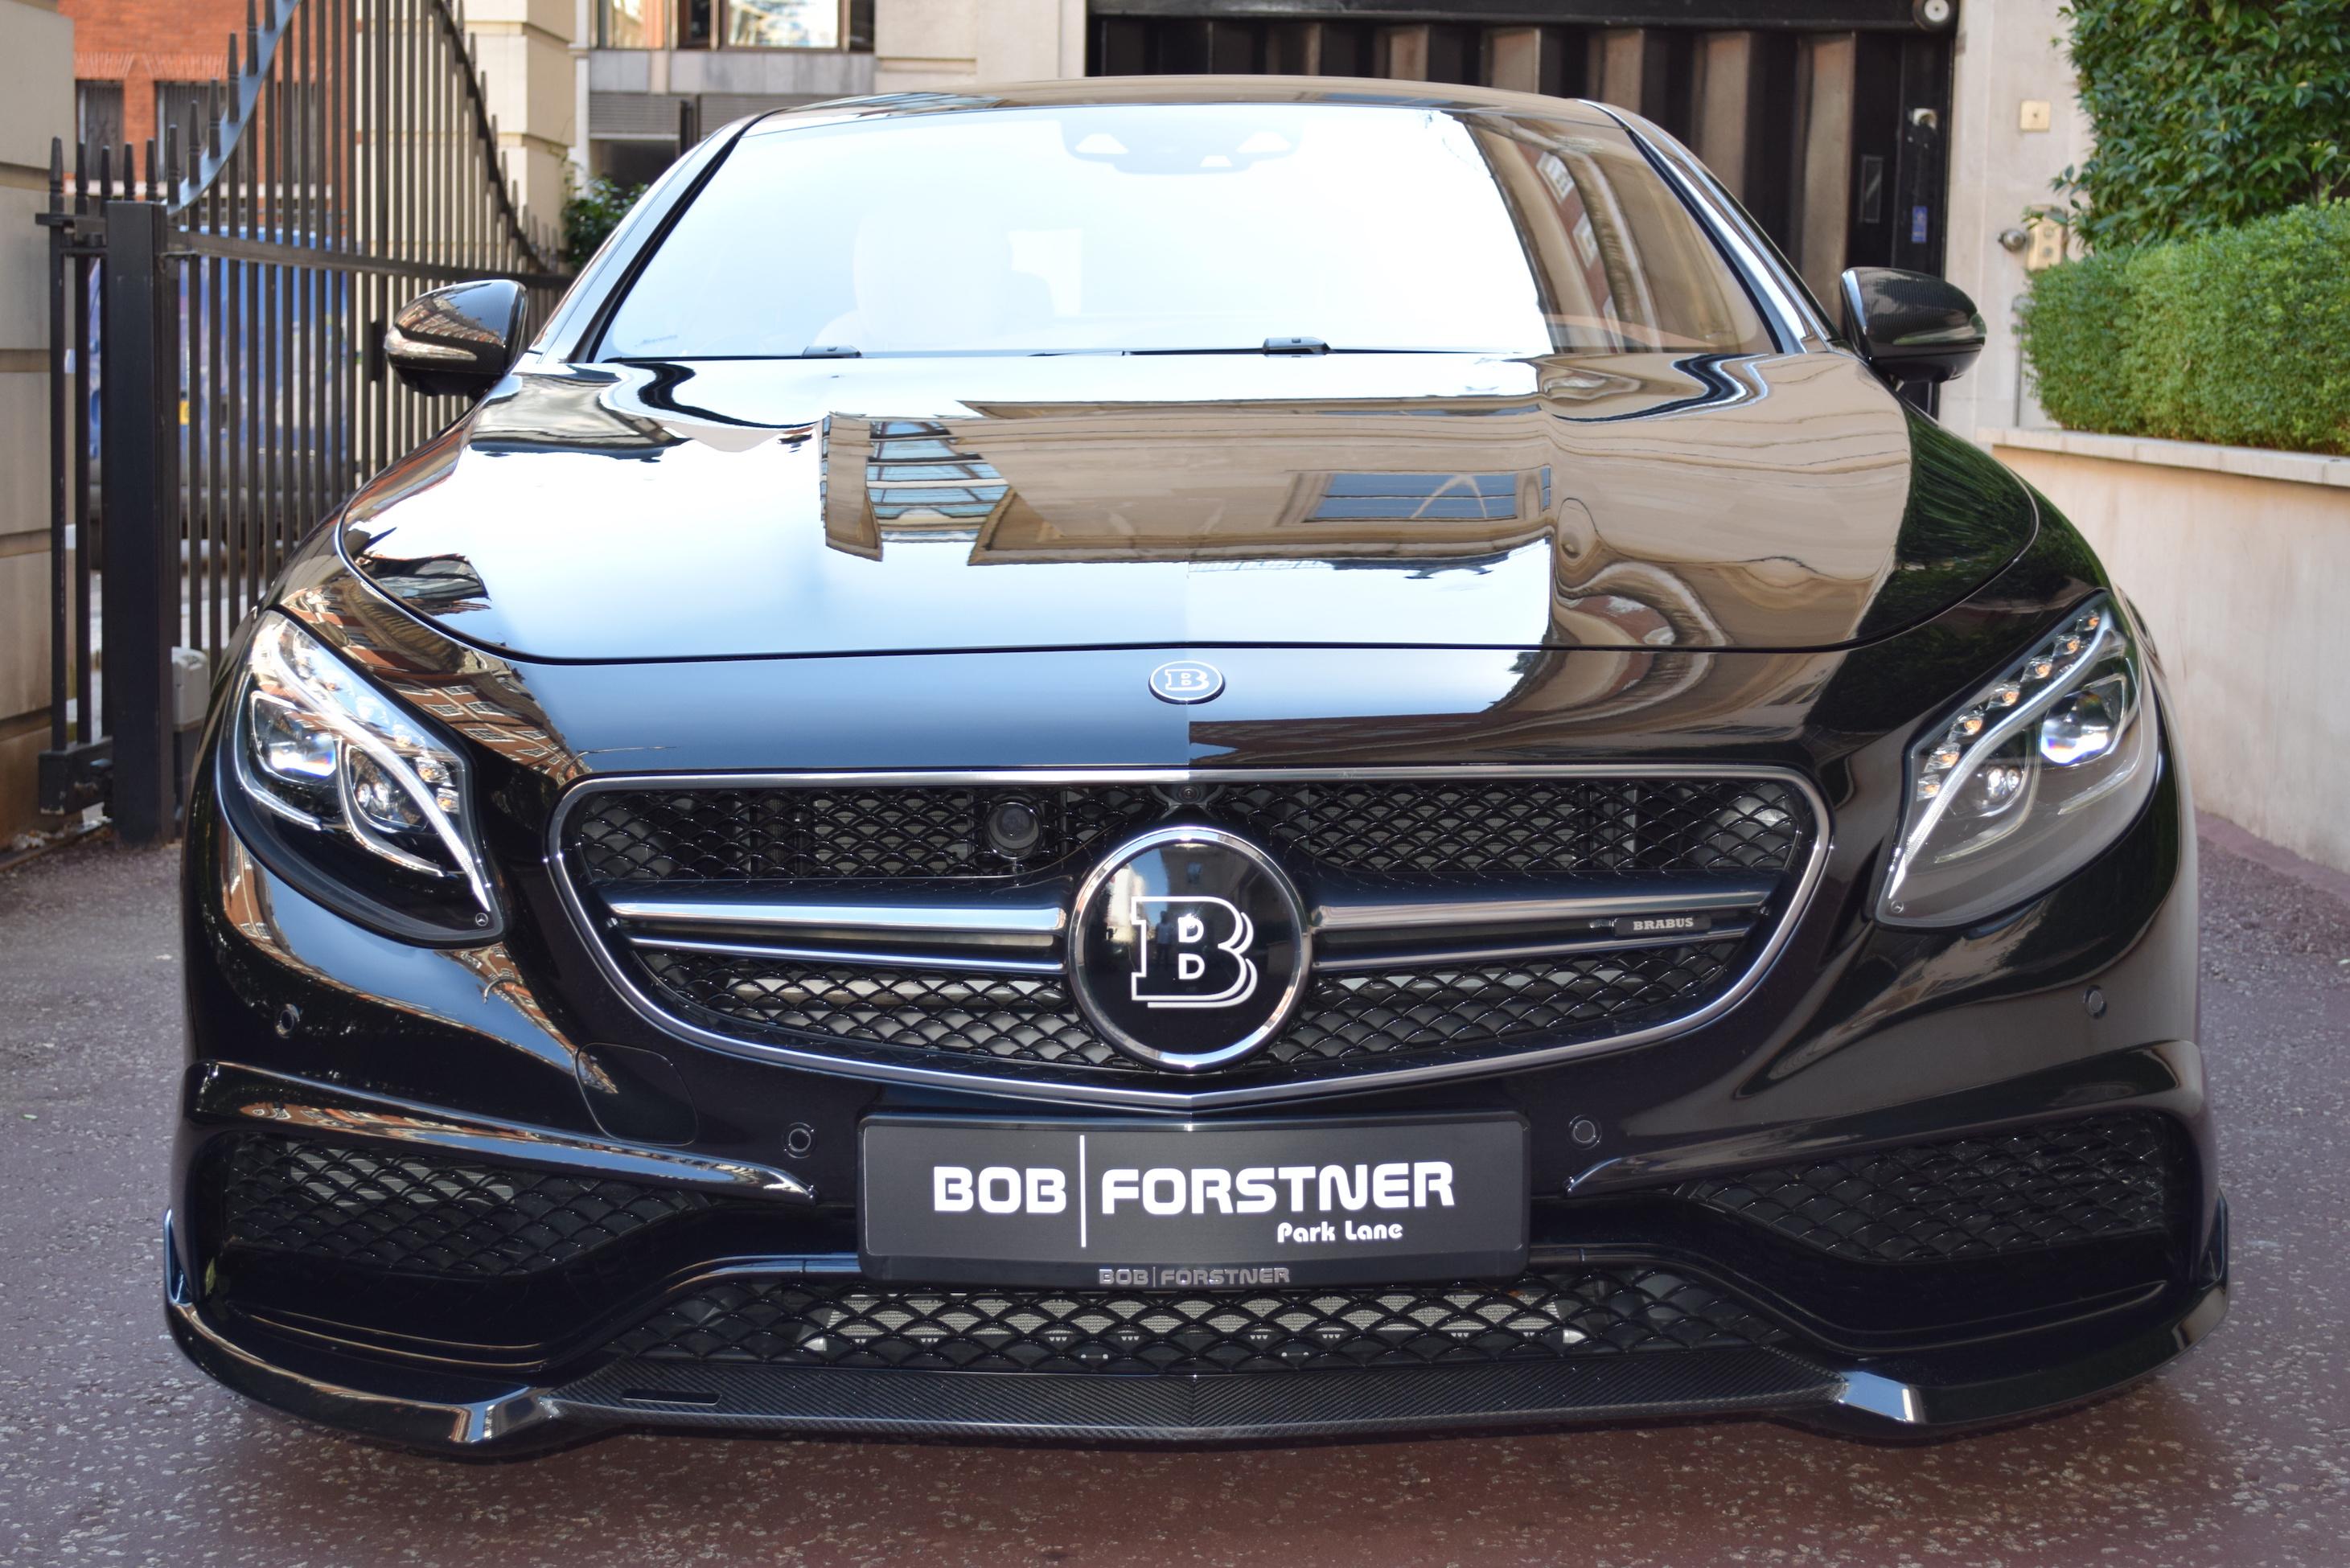 BRABUS Rocket 900 based on Mercedes-AMG S 65 coupé